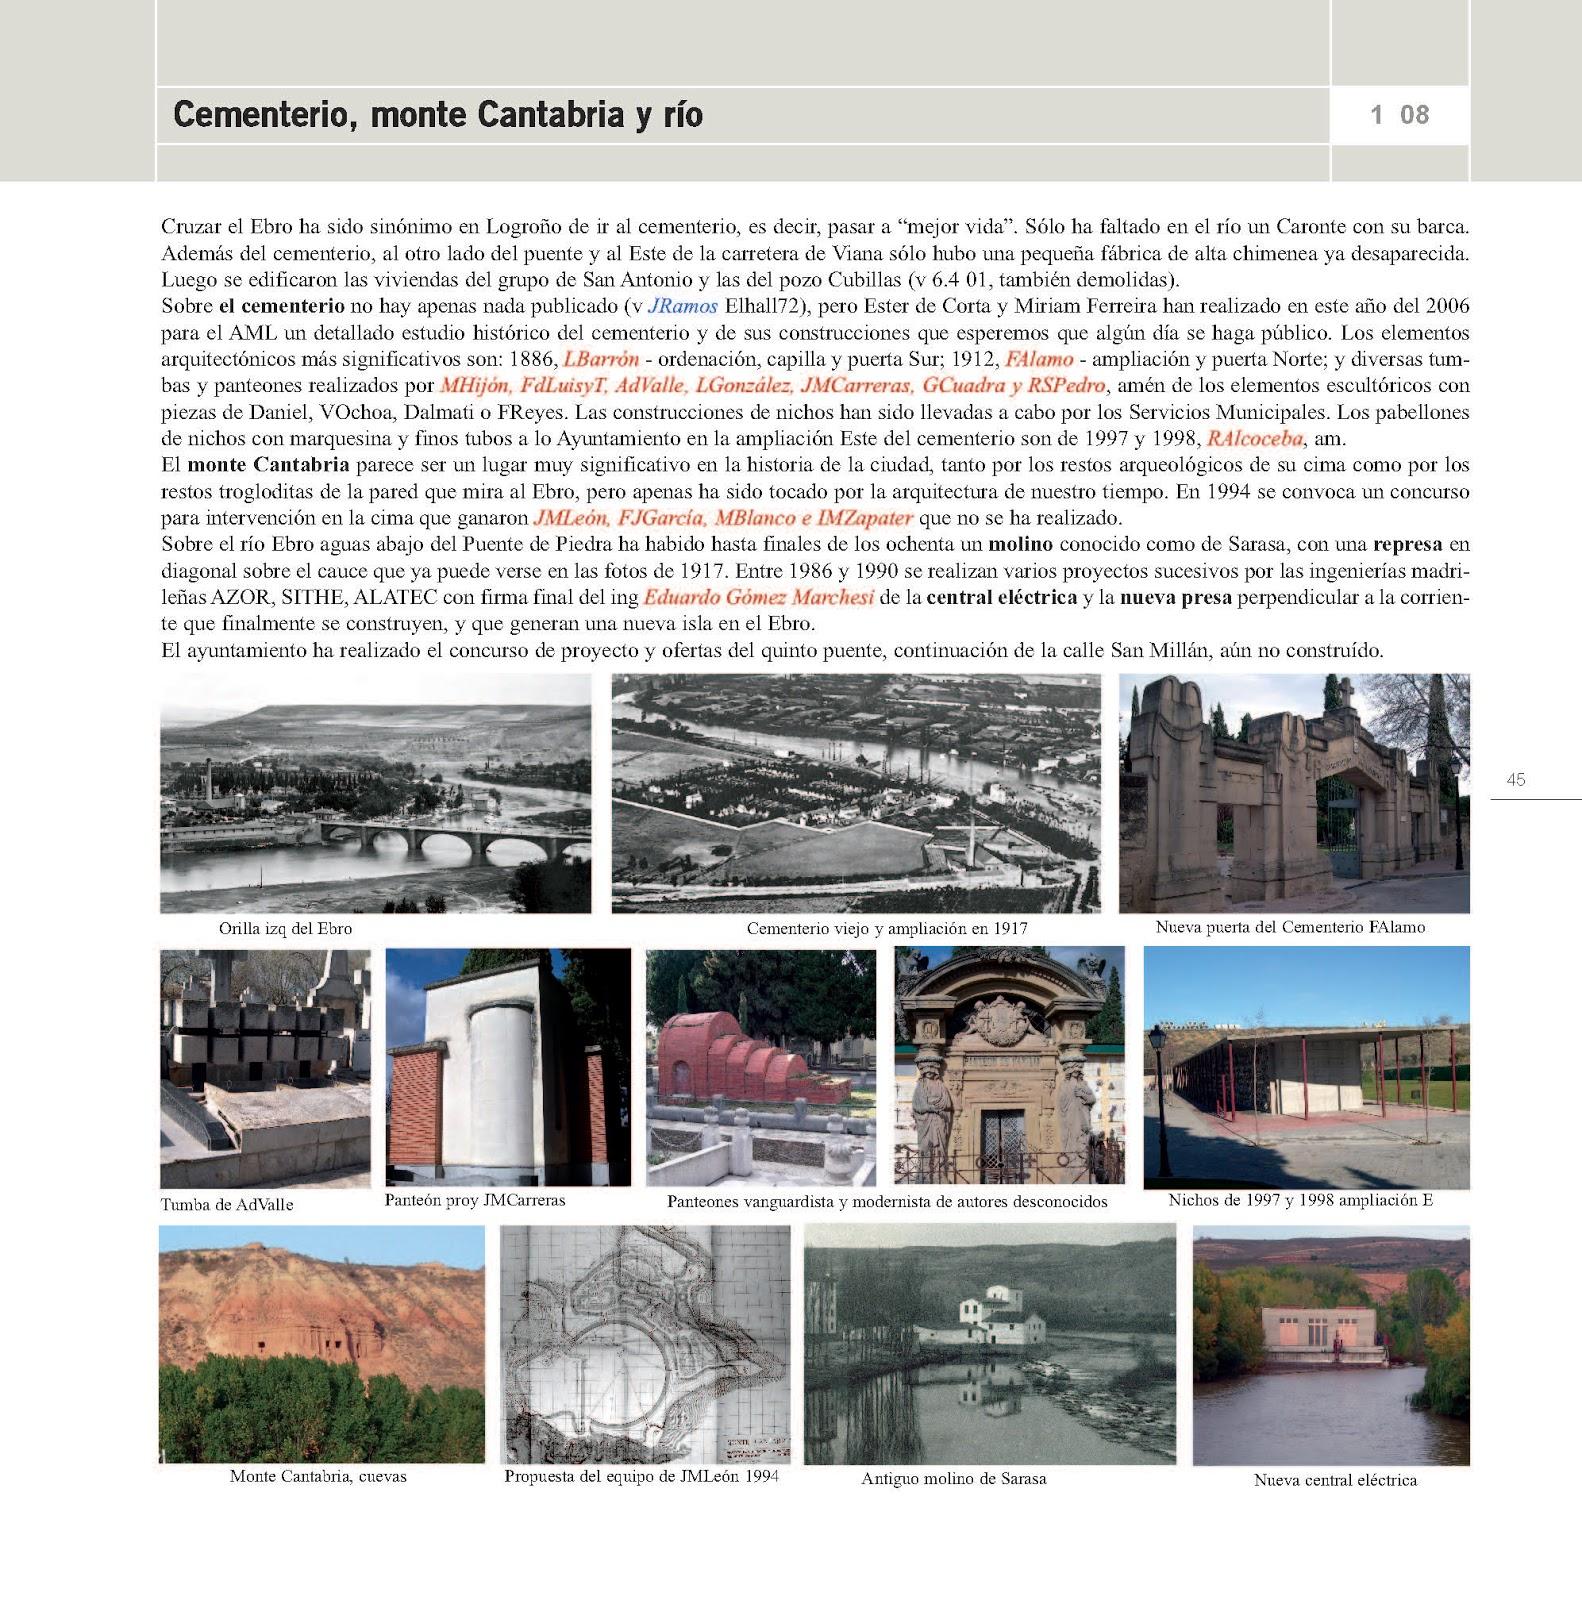 Guia de arquitectura de logro o paginas cementerio for Paginas arquitectura